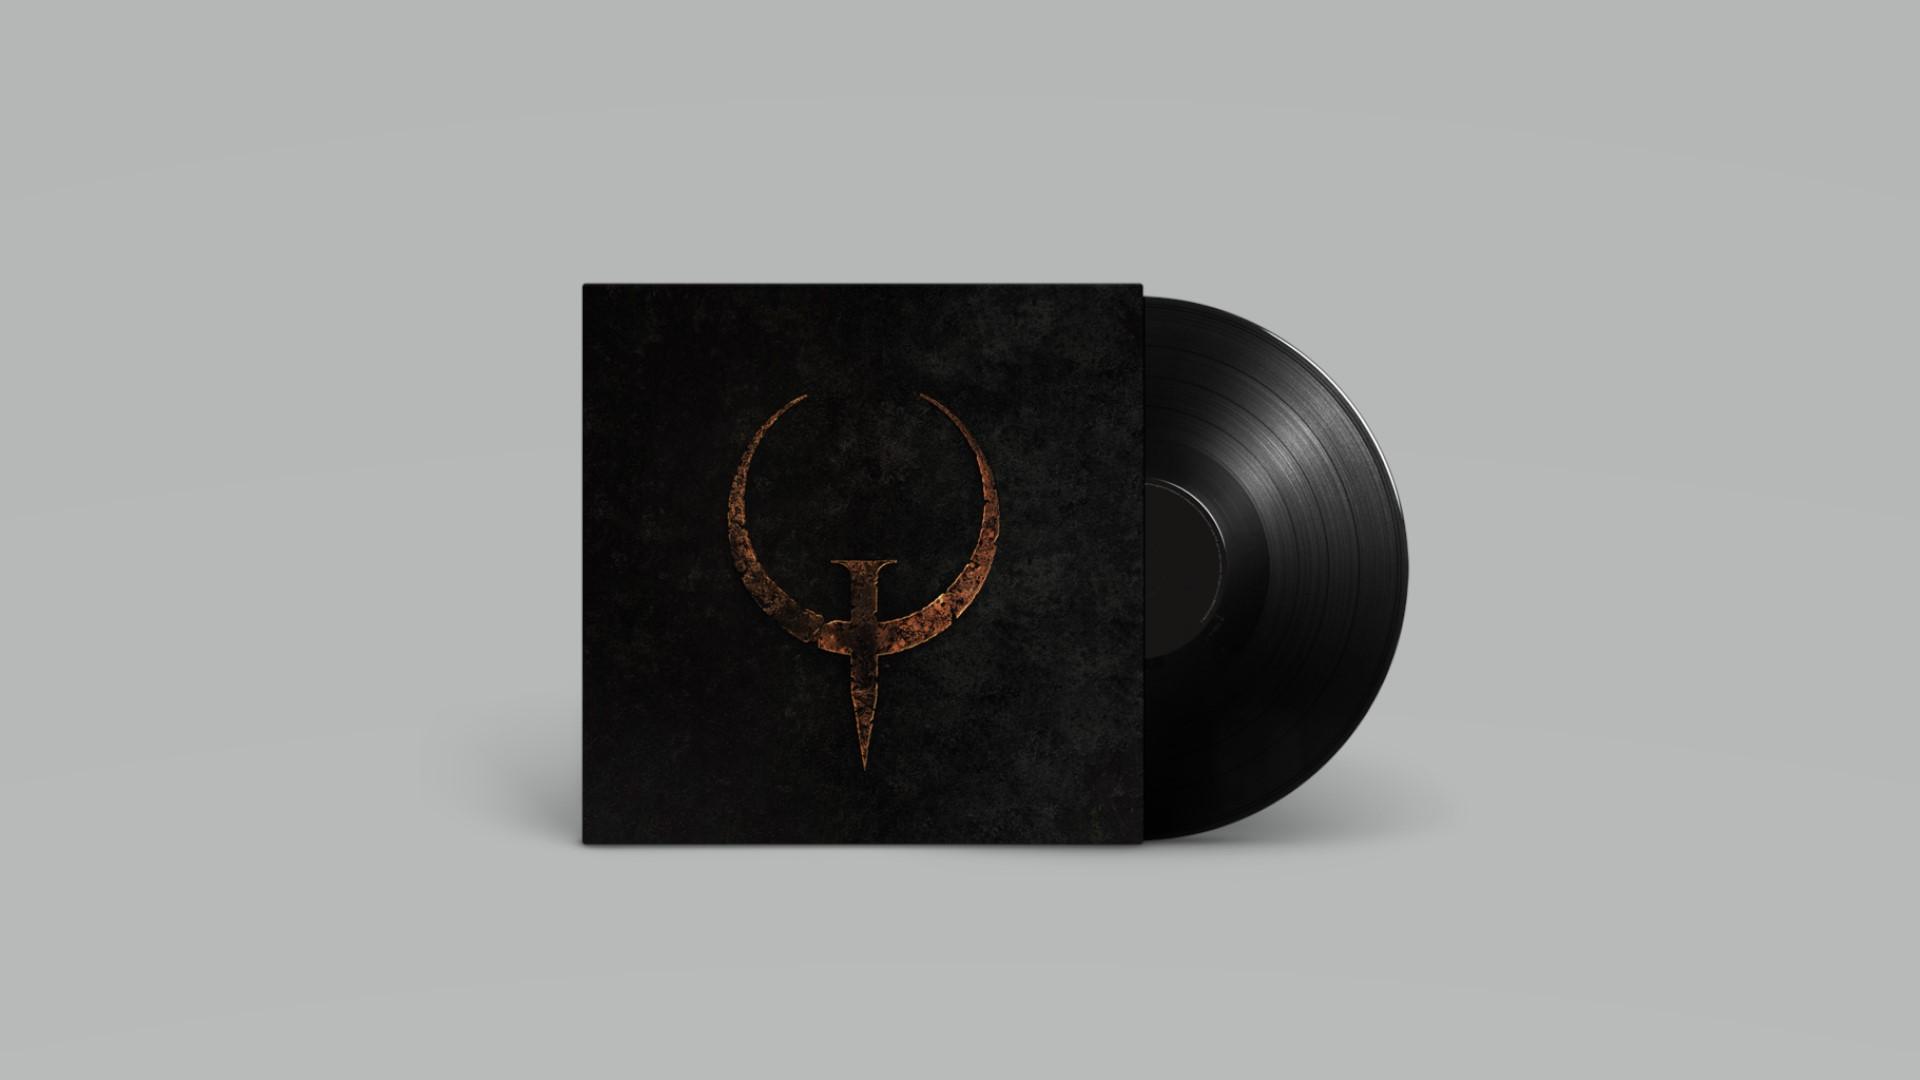 Nine Inch Nails' Quake soundtrack gets a vinyl remaster